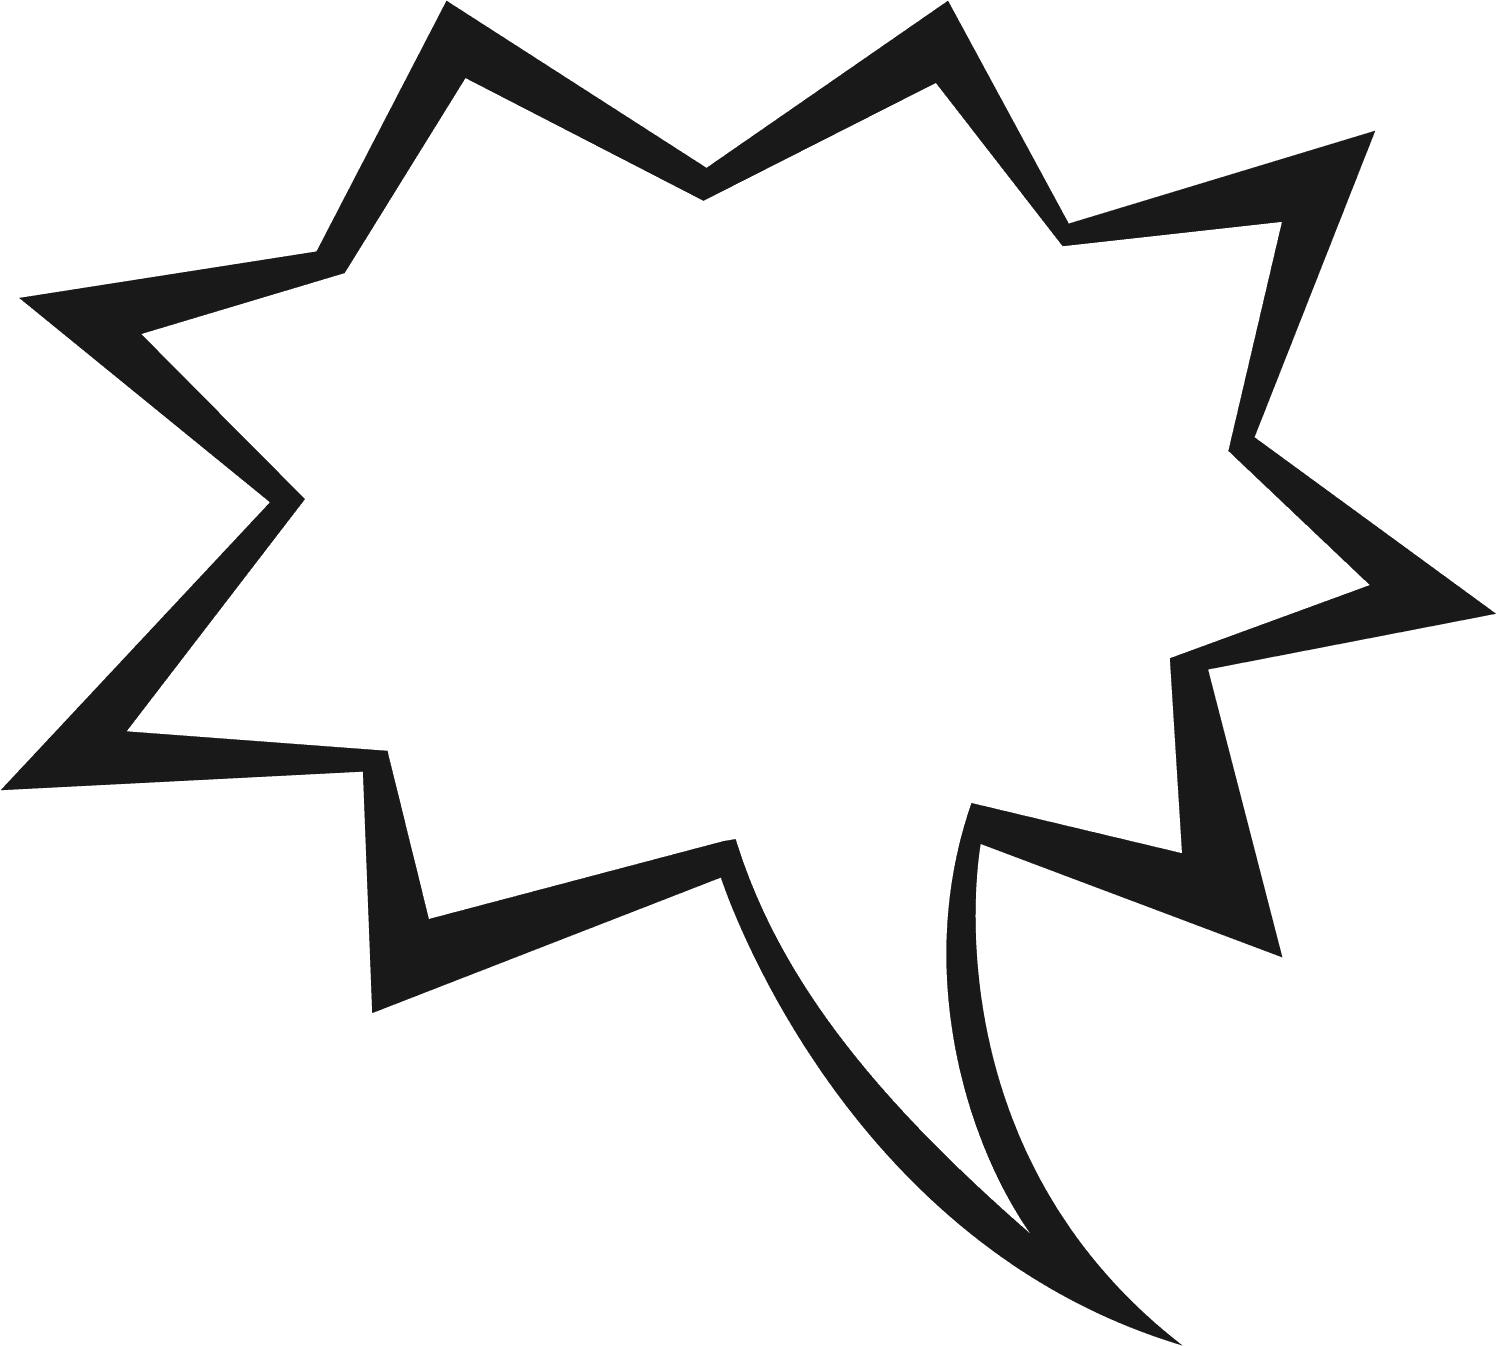 Naruto clipart #7, Download drawings